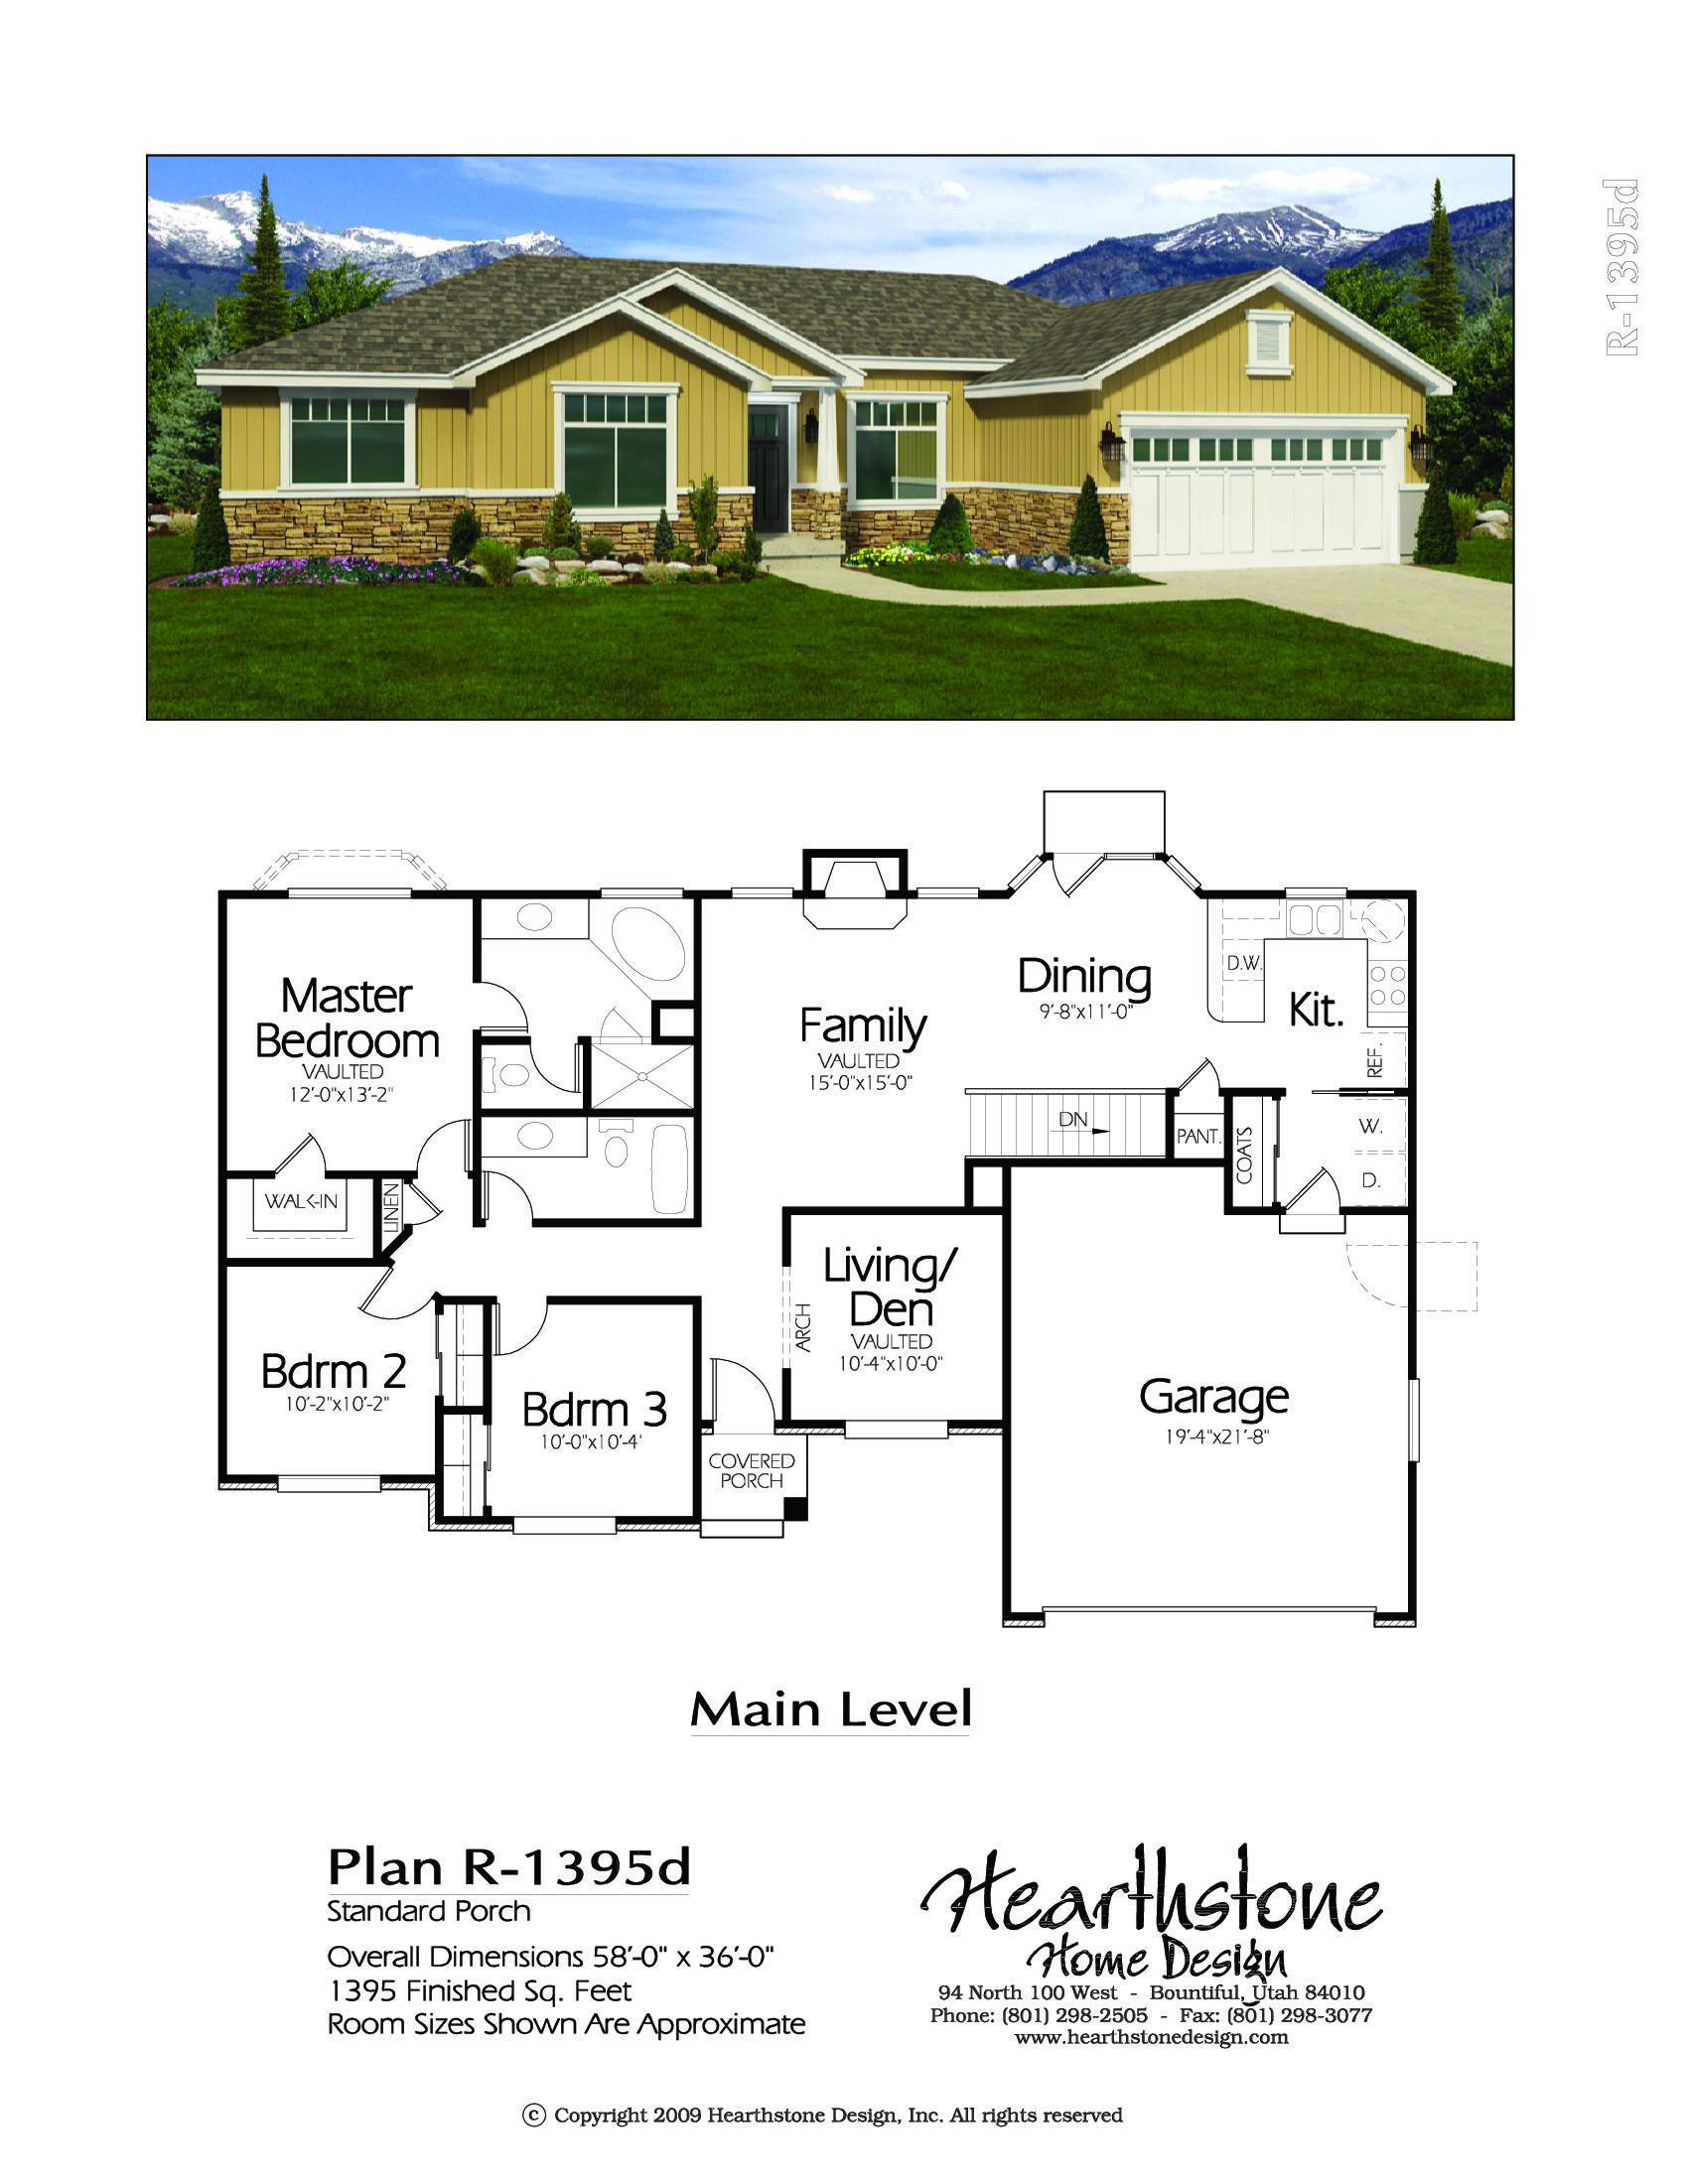 R 1395d Hearthstone Home Design House Blueprints Sims House Plans New House Plans